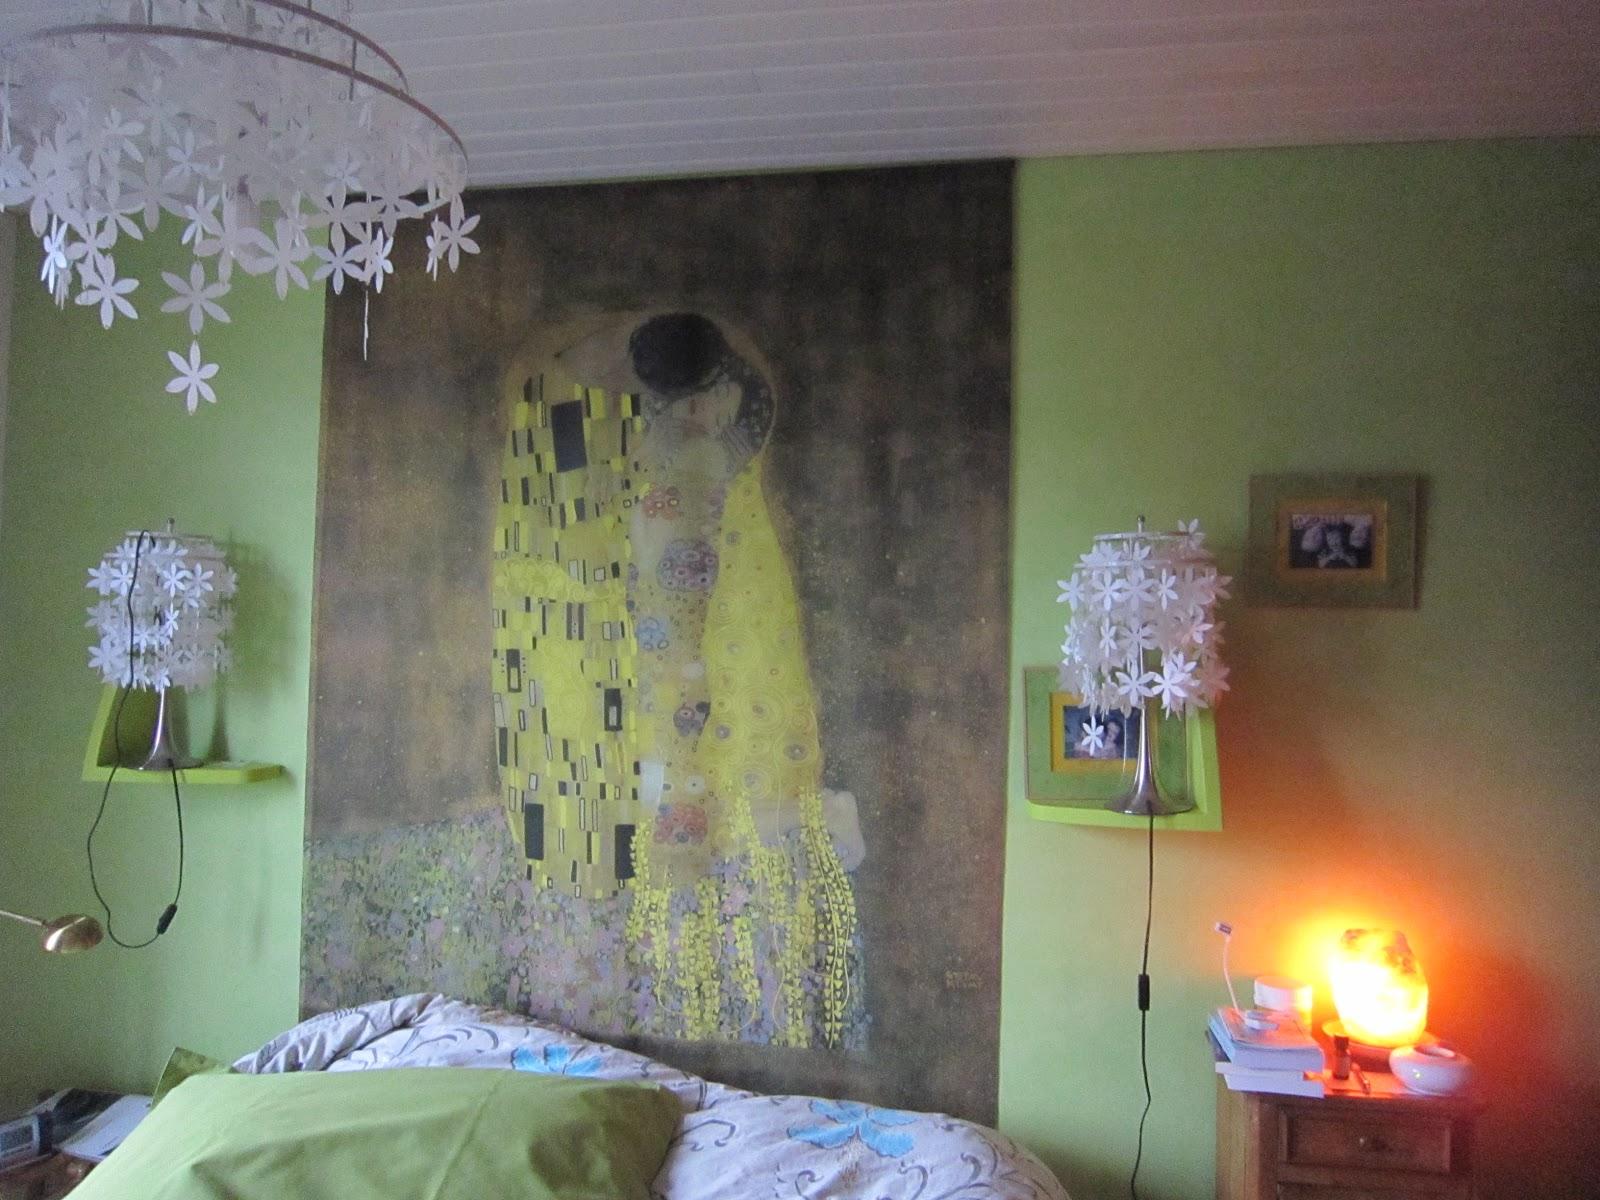 fengshuimarieline le feng shui de l 39 amour. Black Bedroom Furniture Sets. Home Design Ideas